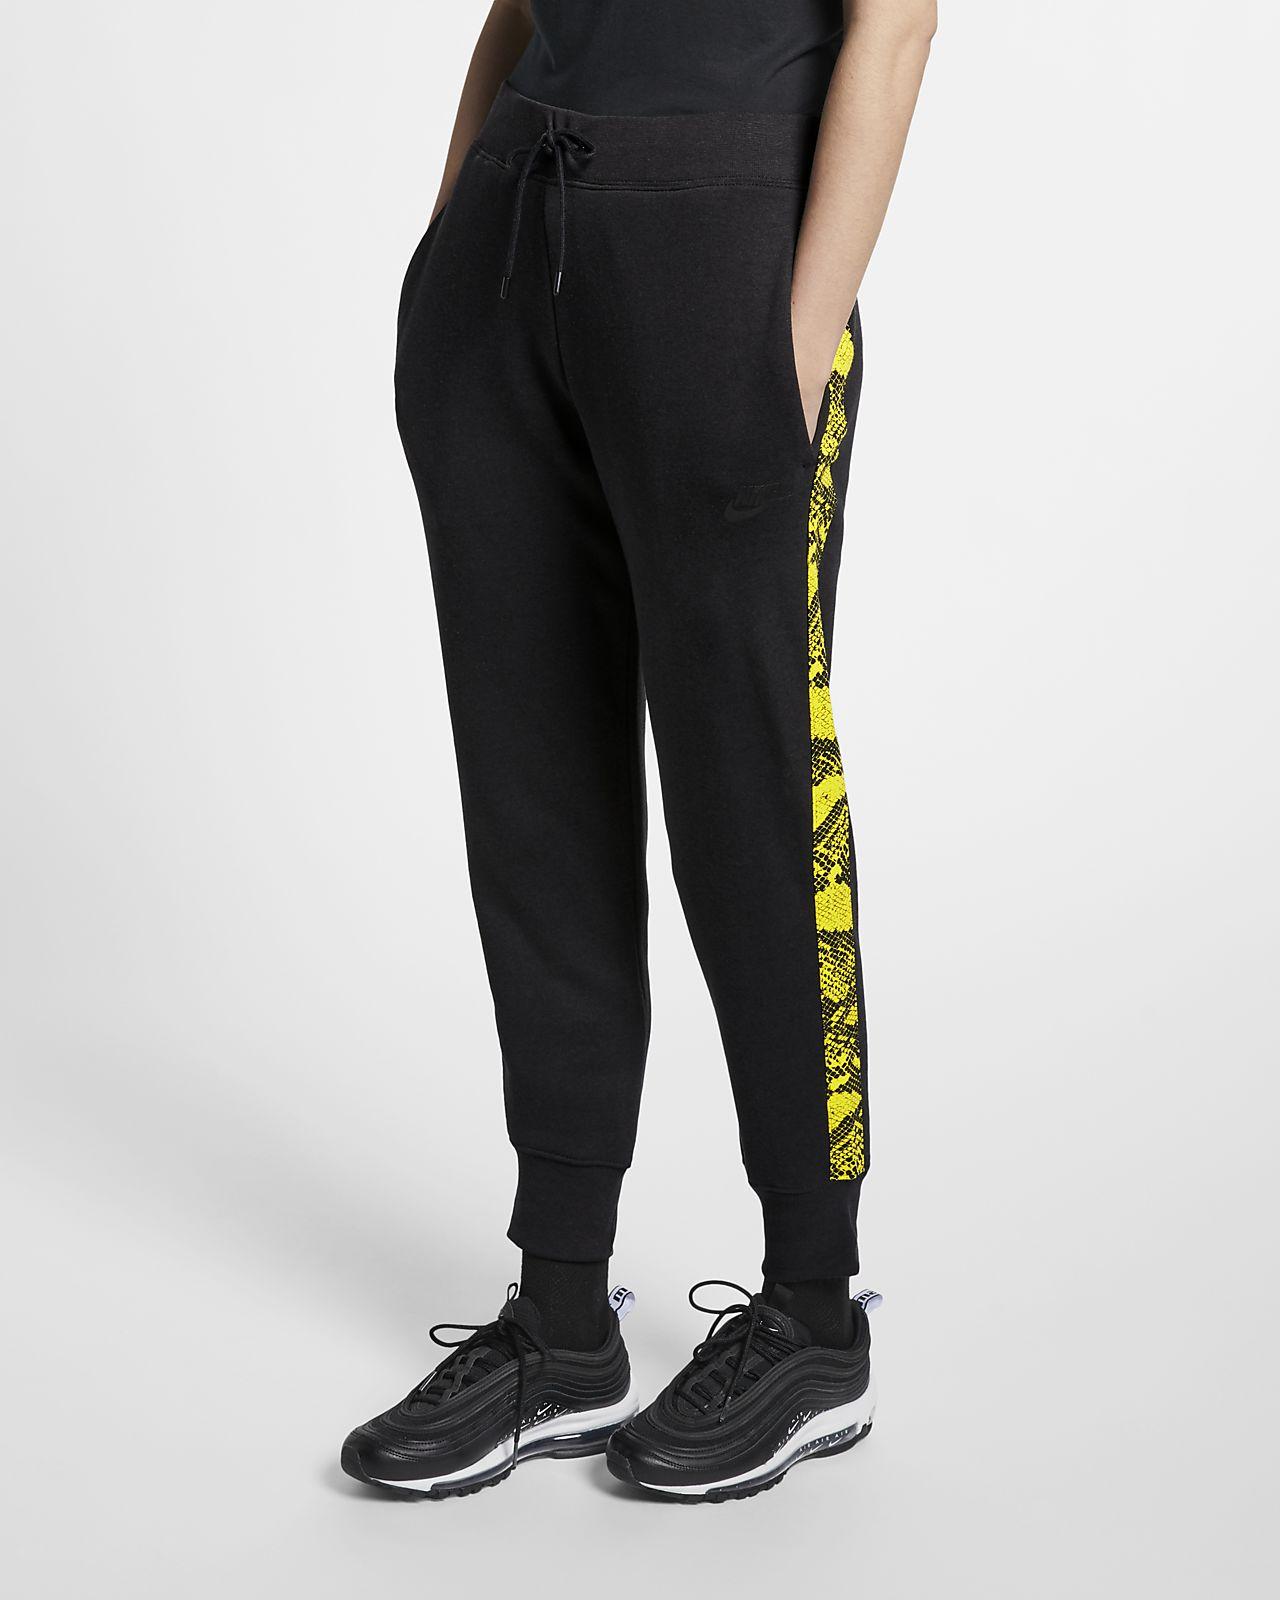 Pantalon à imprimé animal Nike Sportswear pour Femme